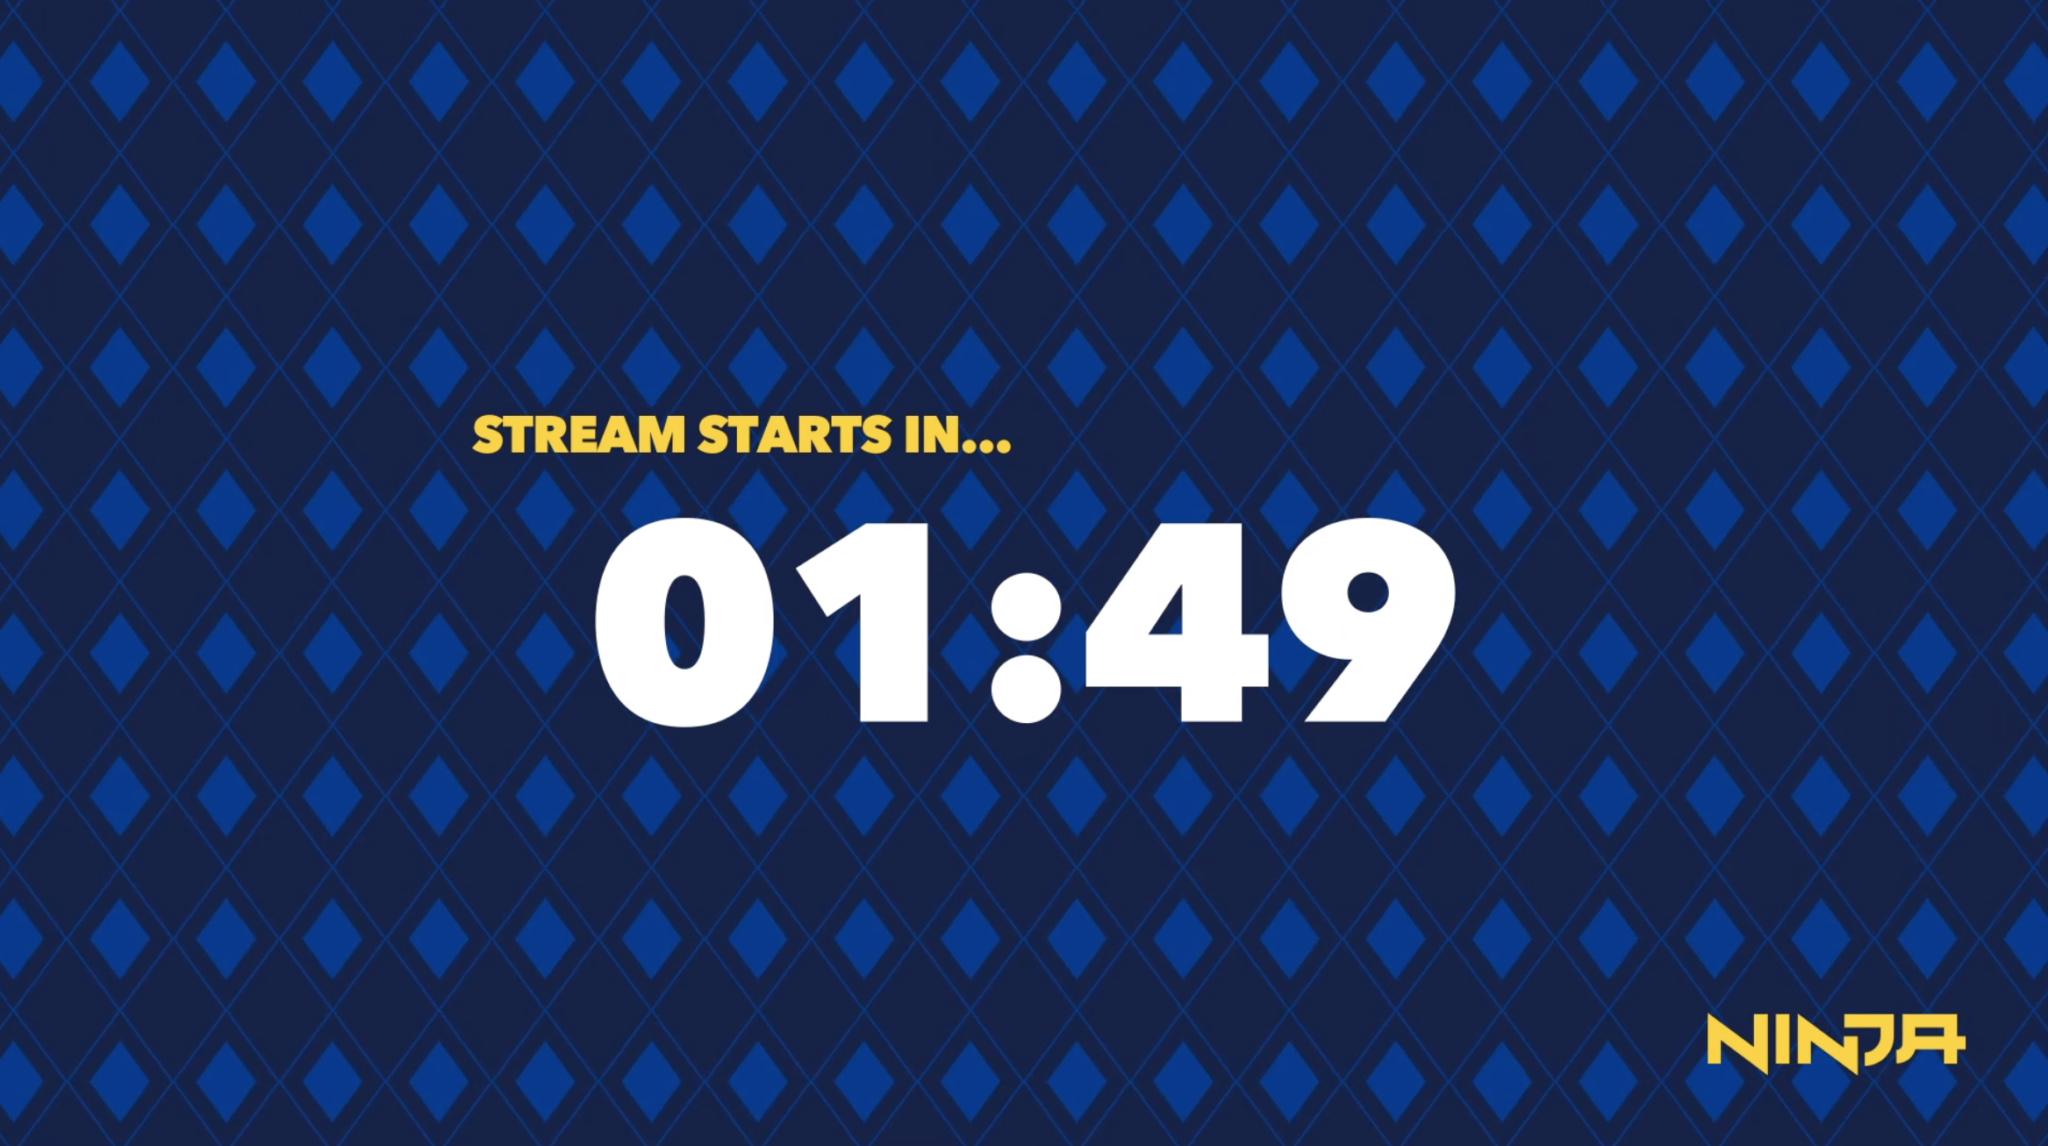 Ninja countdown on Twitch